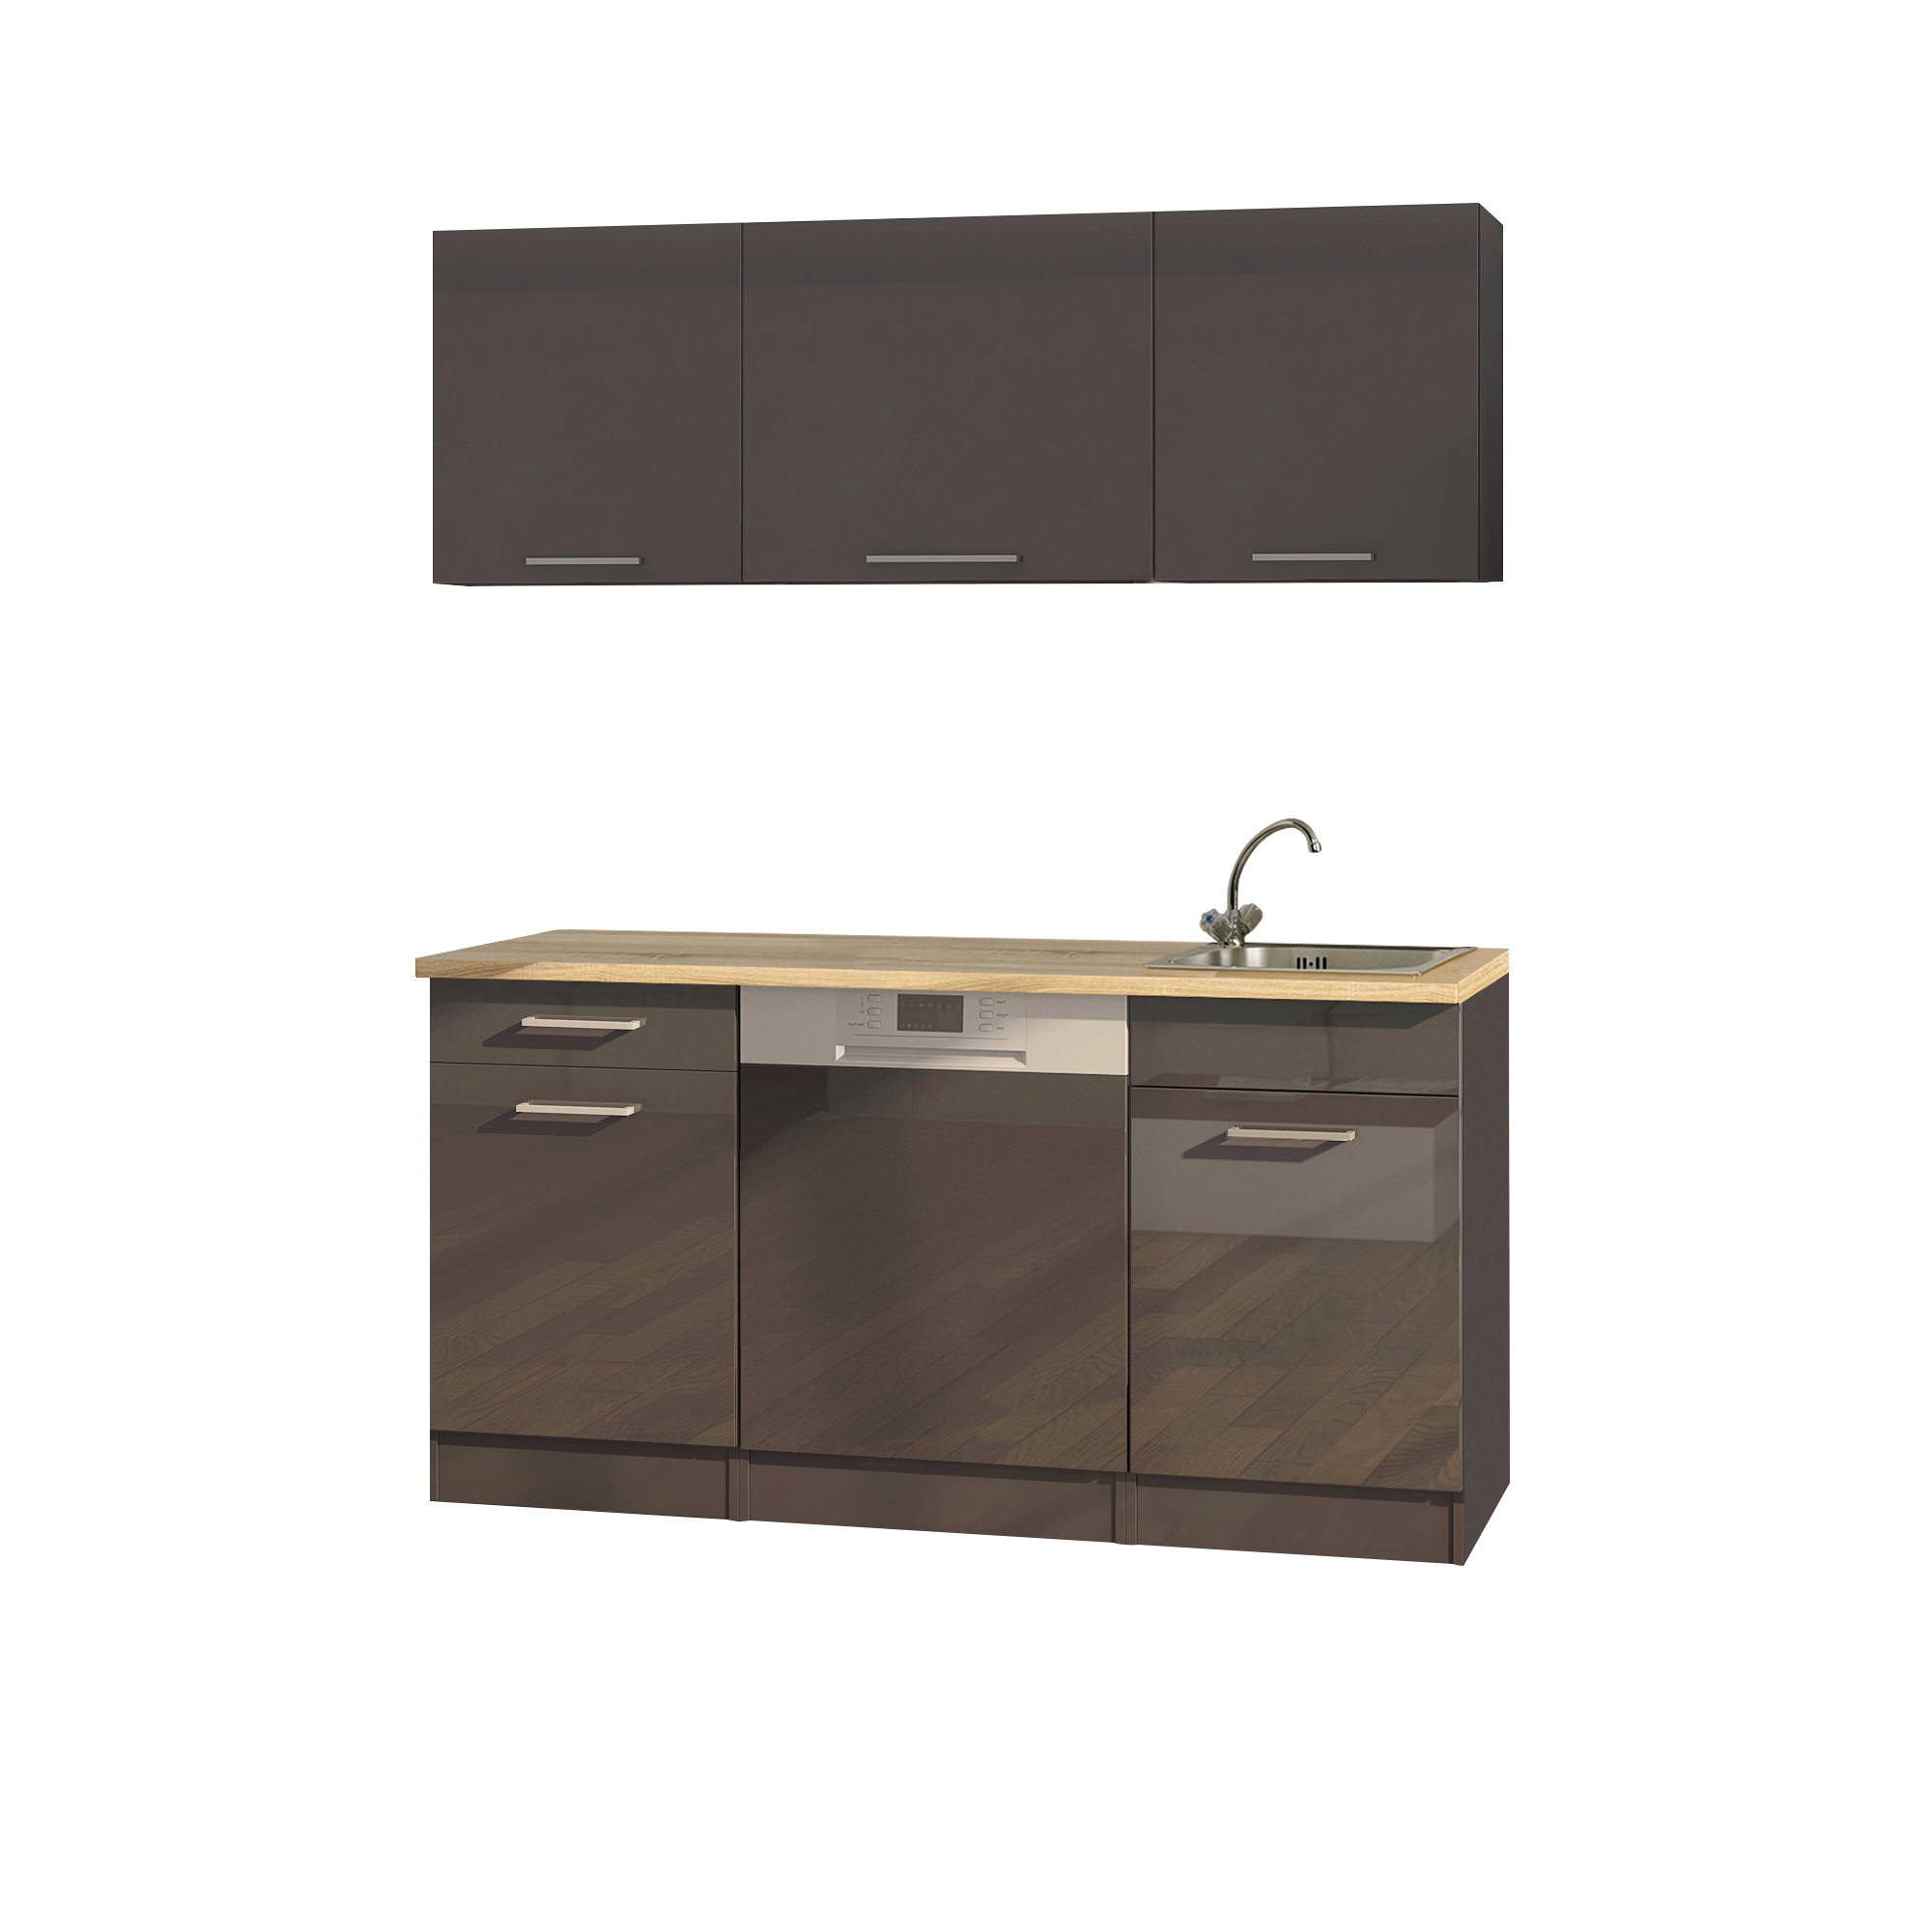 Full Size of Büro Küche Pantry Büroküche Regeln Büro Küche Gestalten Reinigungsplan Büro Küche Küche Büroküche